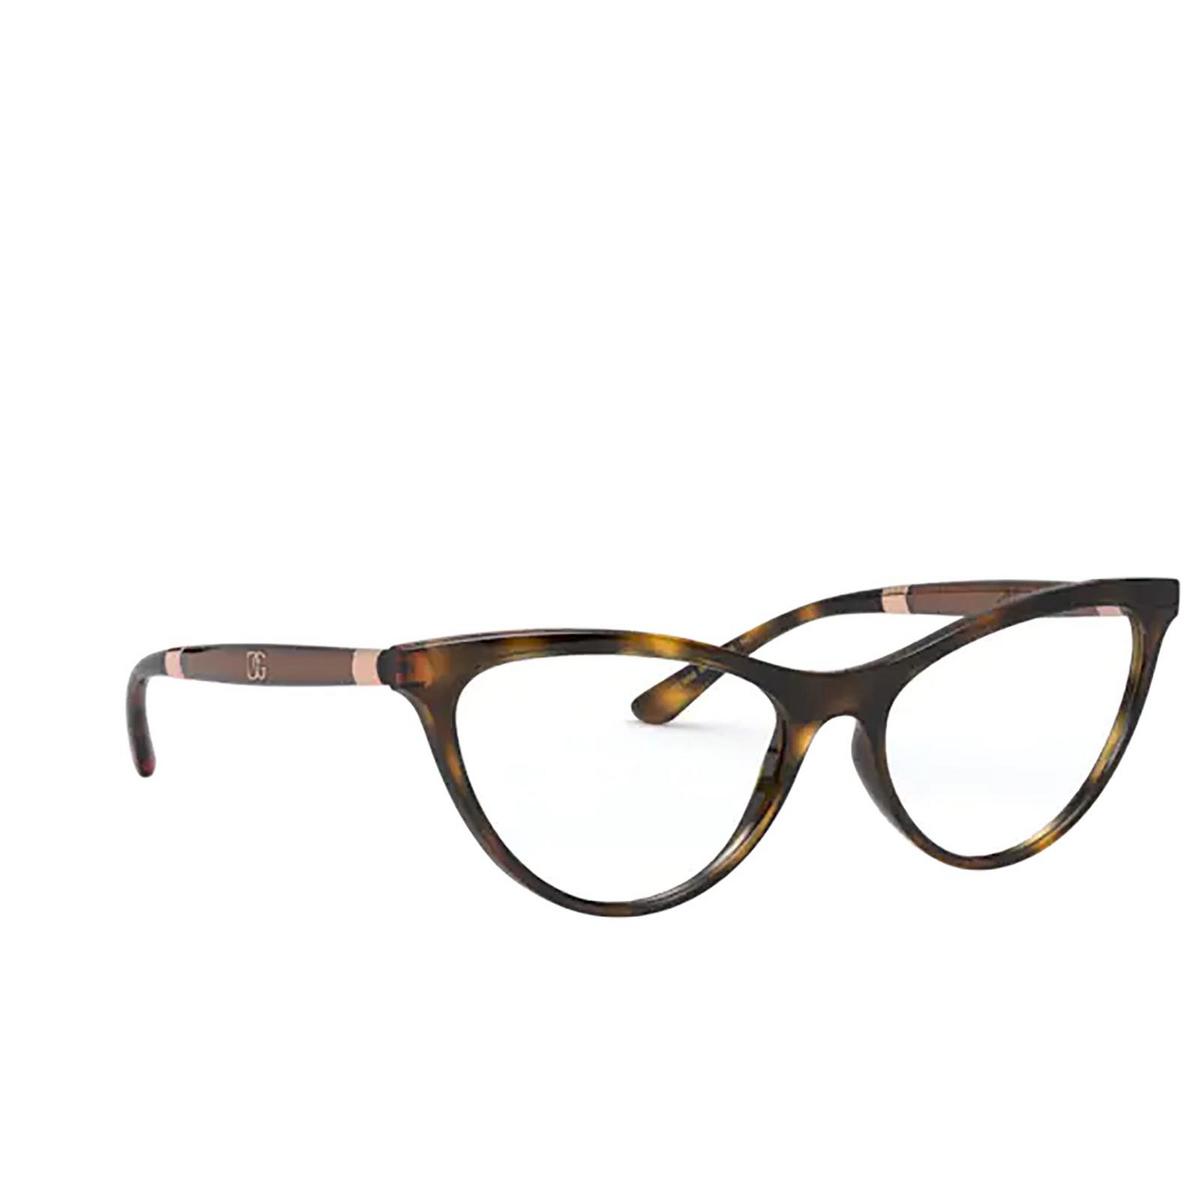 Dolce & Gabbana® Cat-eye Eyeglasses: DG5058 color Havana 502 - three-quarters view.